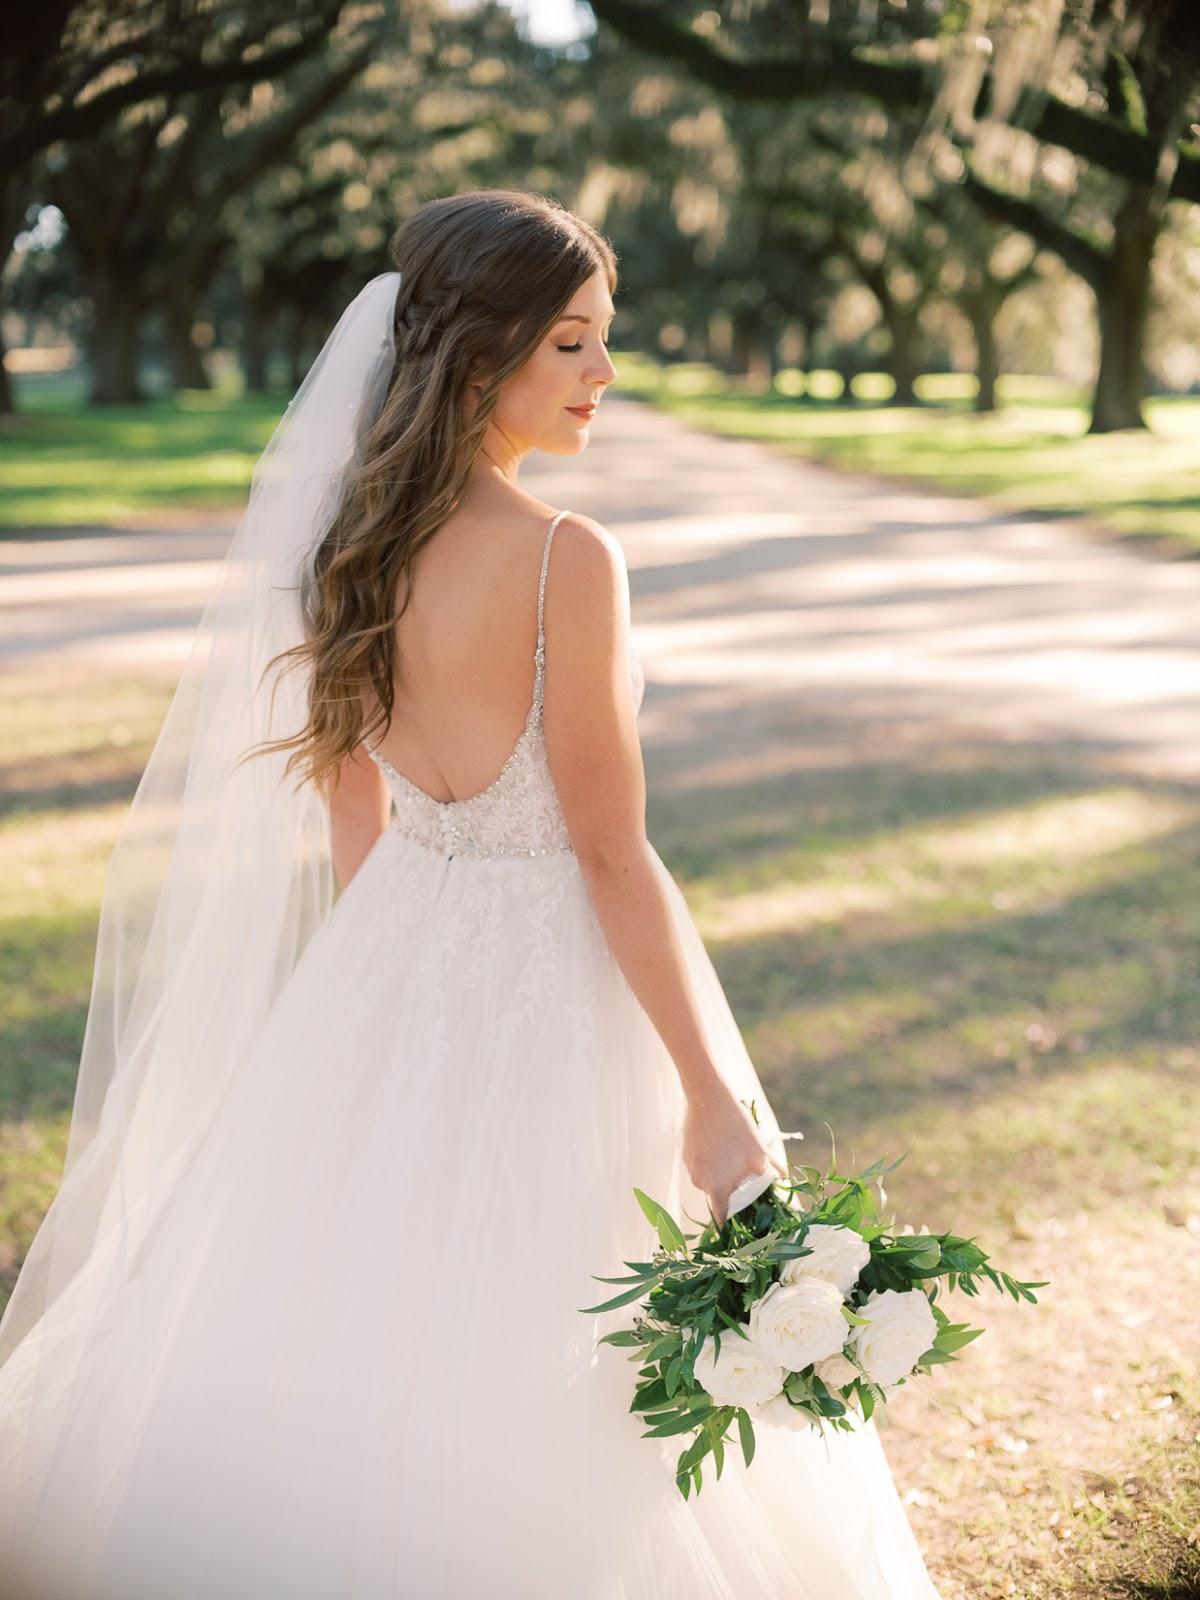 Ceremony Wedding Dress - Chasing Cinderella